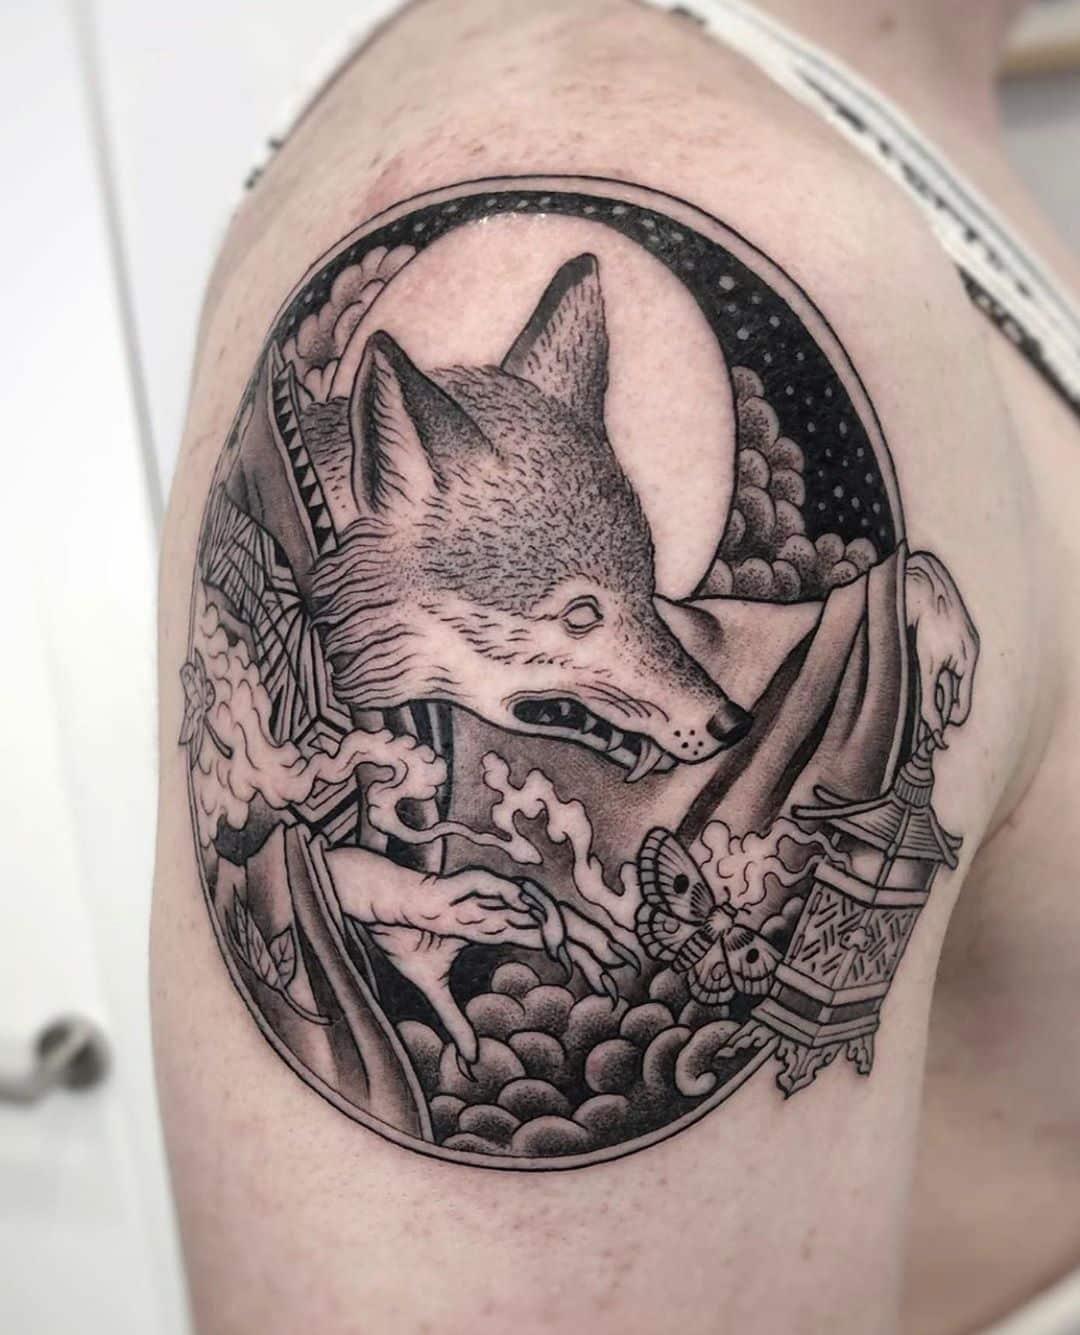 black-and-grey-tattoo-style-fox